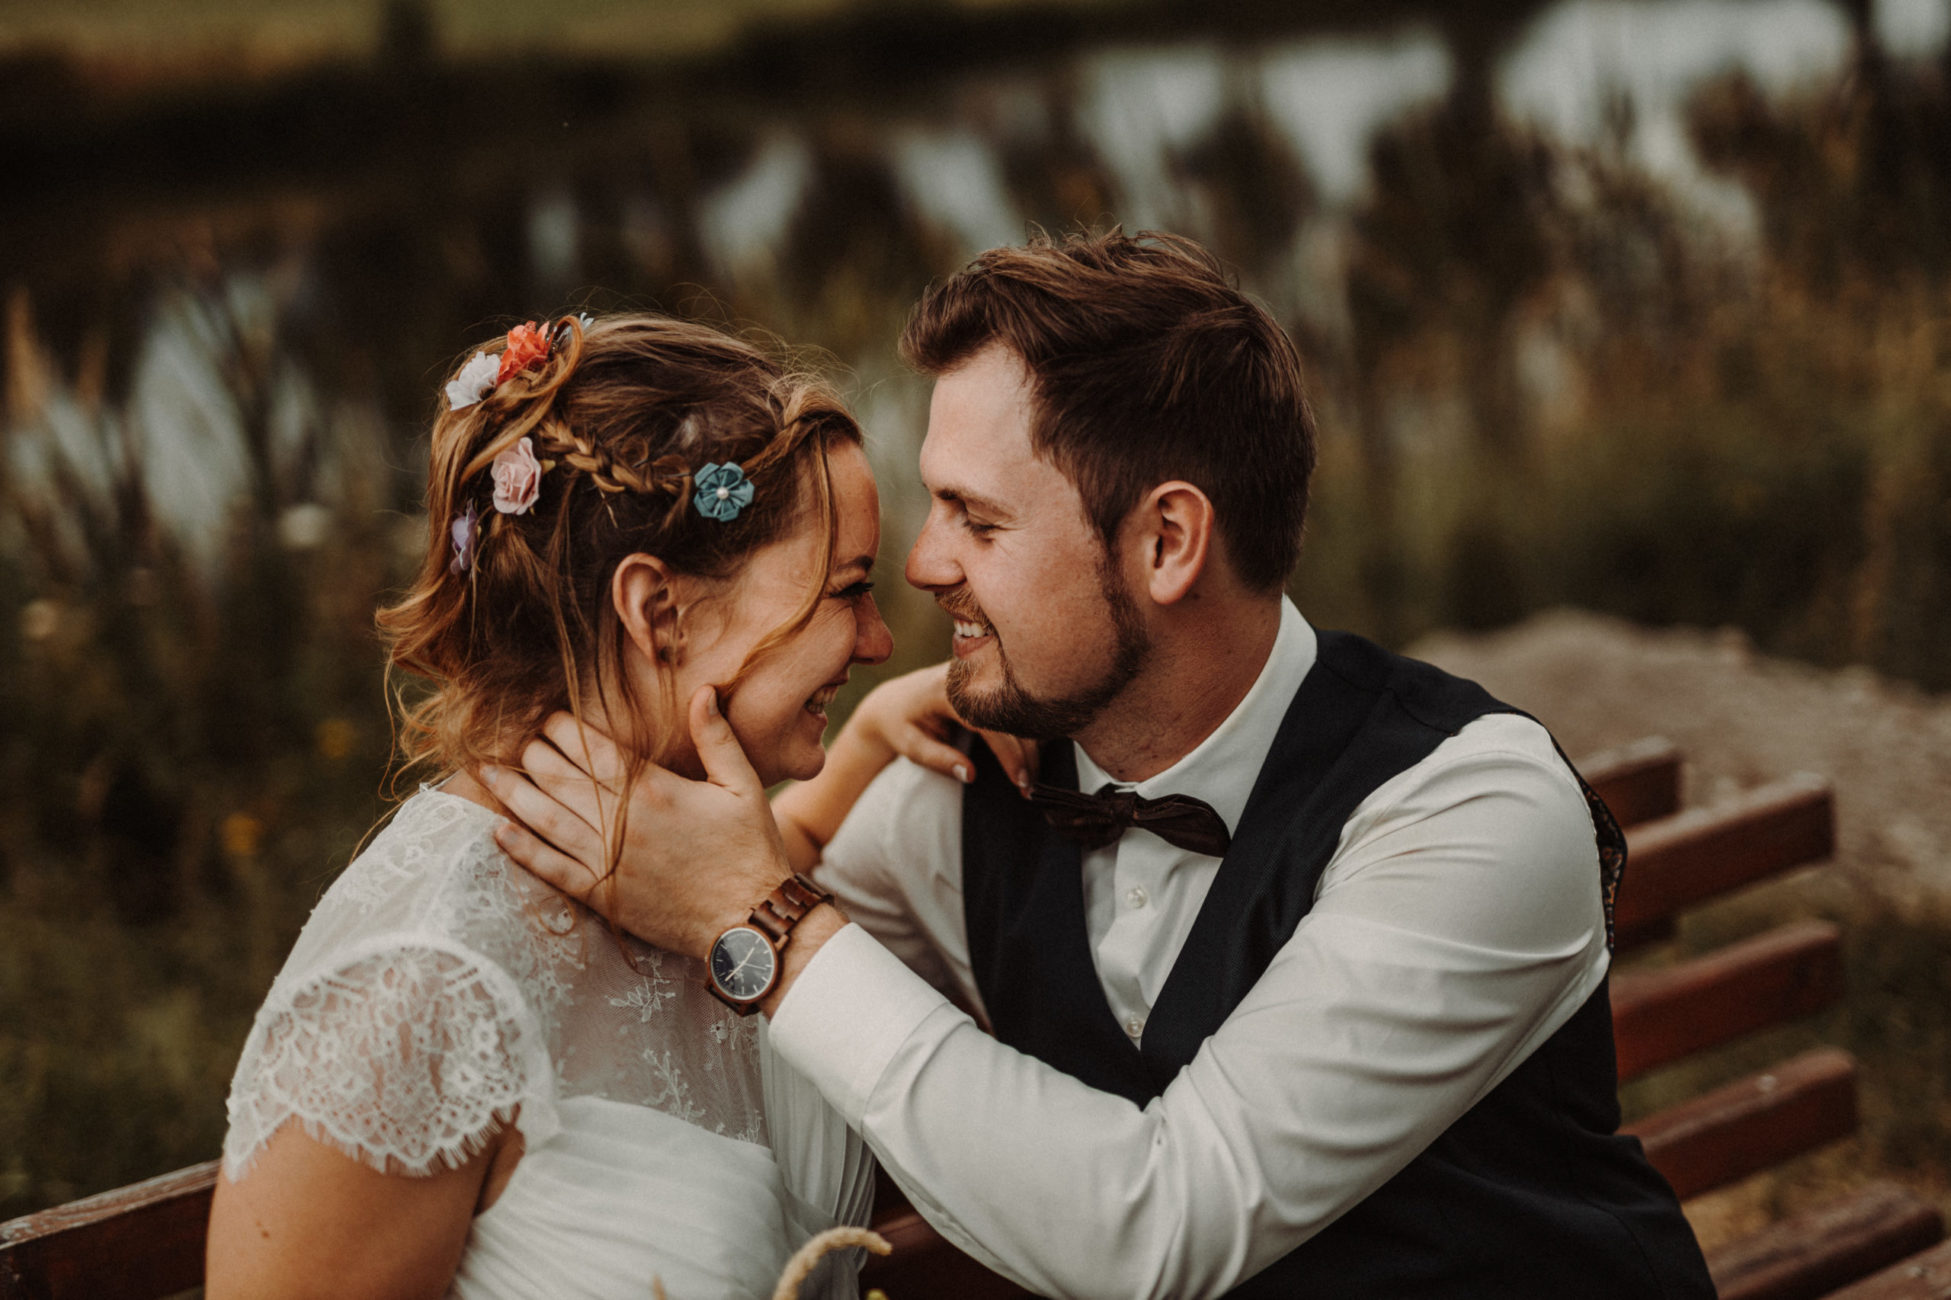 Hochzeit Ilmenau   Haus am See I Couple I Shooting I Wedding I Hochzeit IThüringen Hochzeitsfotografie I Wedding Photography